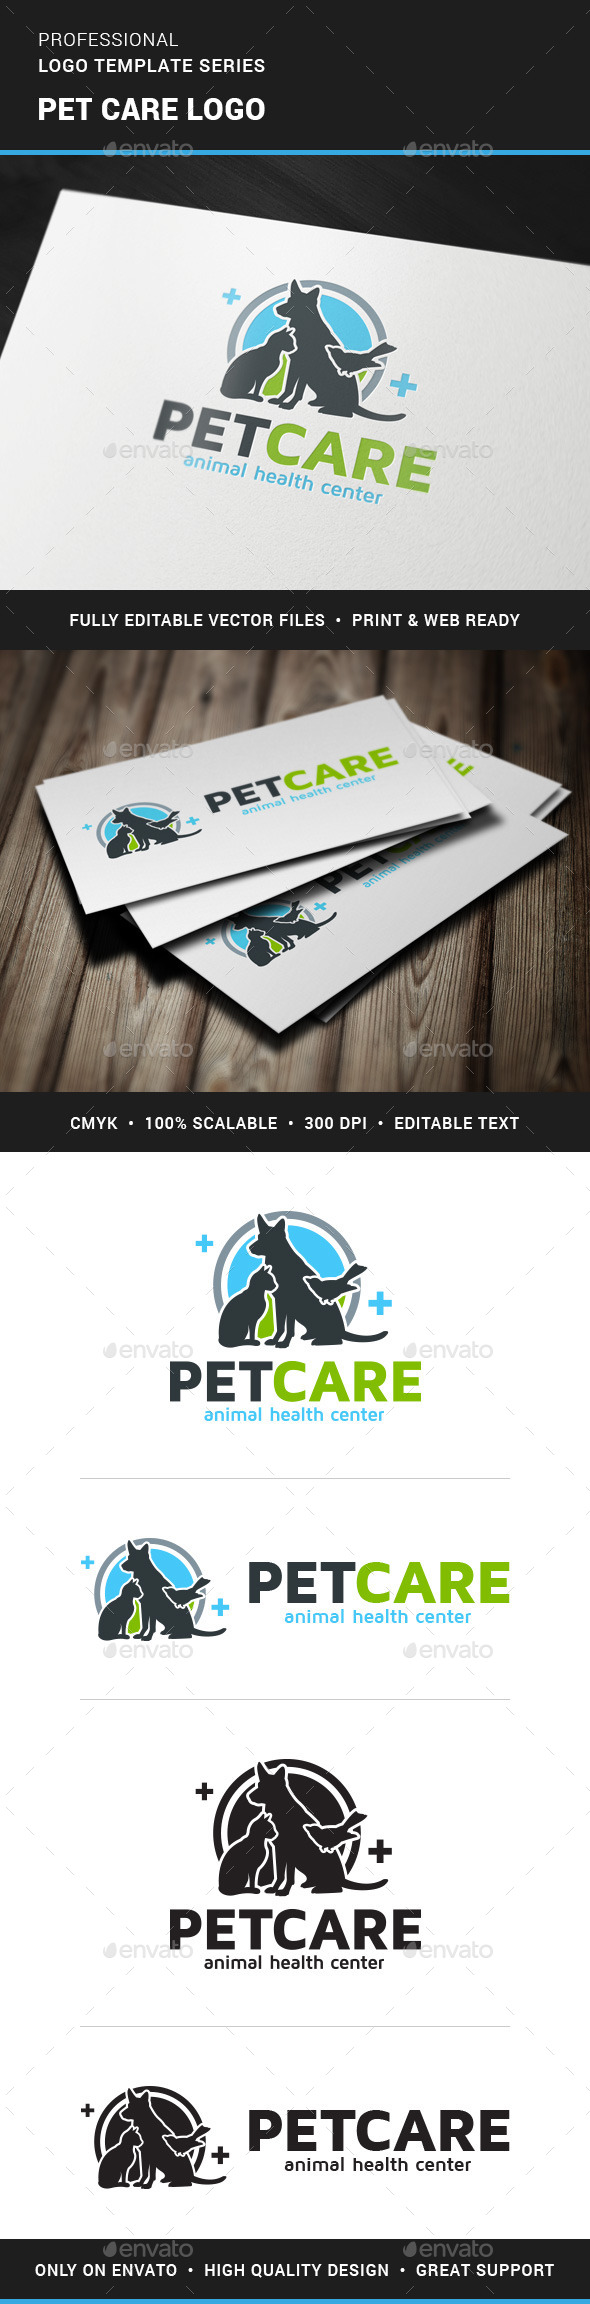 GraphicRiver Pet Care Logo Template 11369584